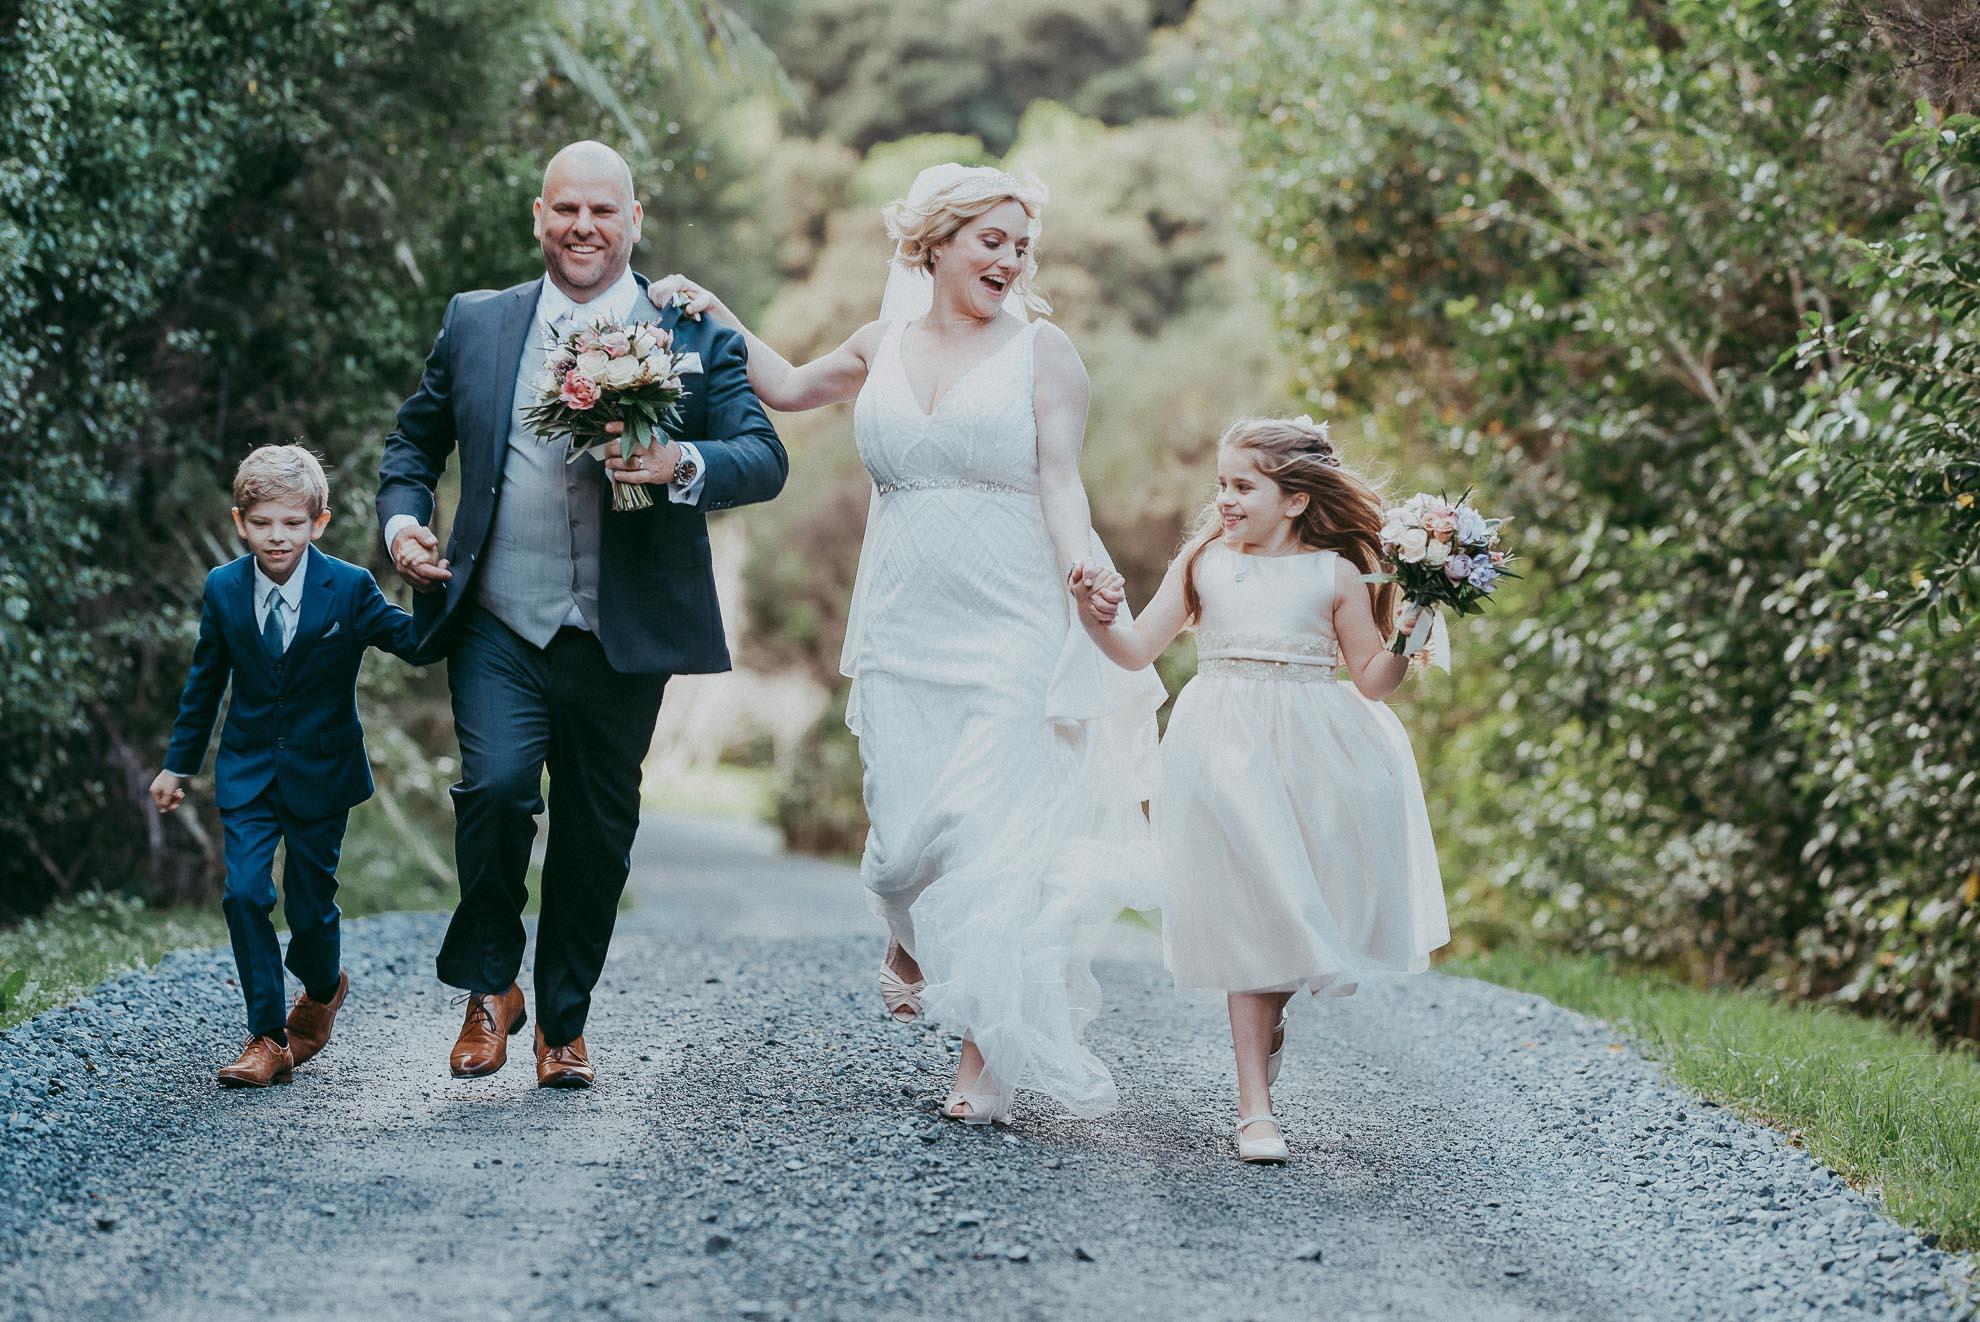 wedding-by-levien-319.JPG